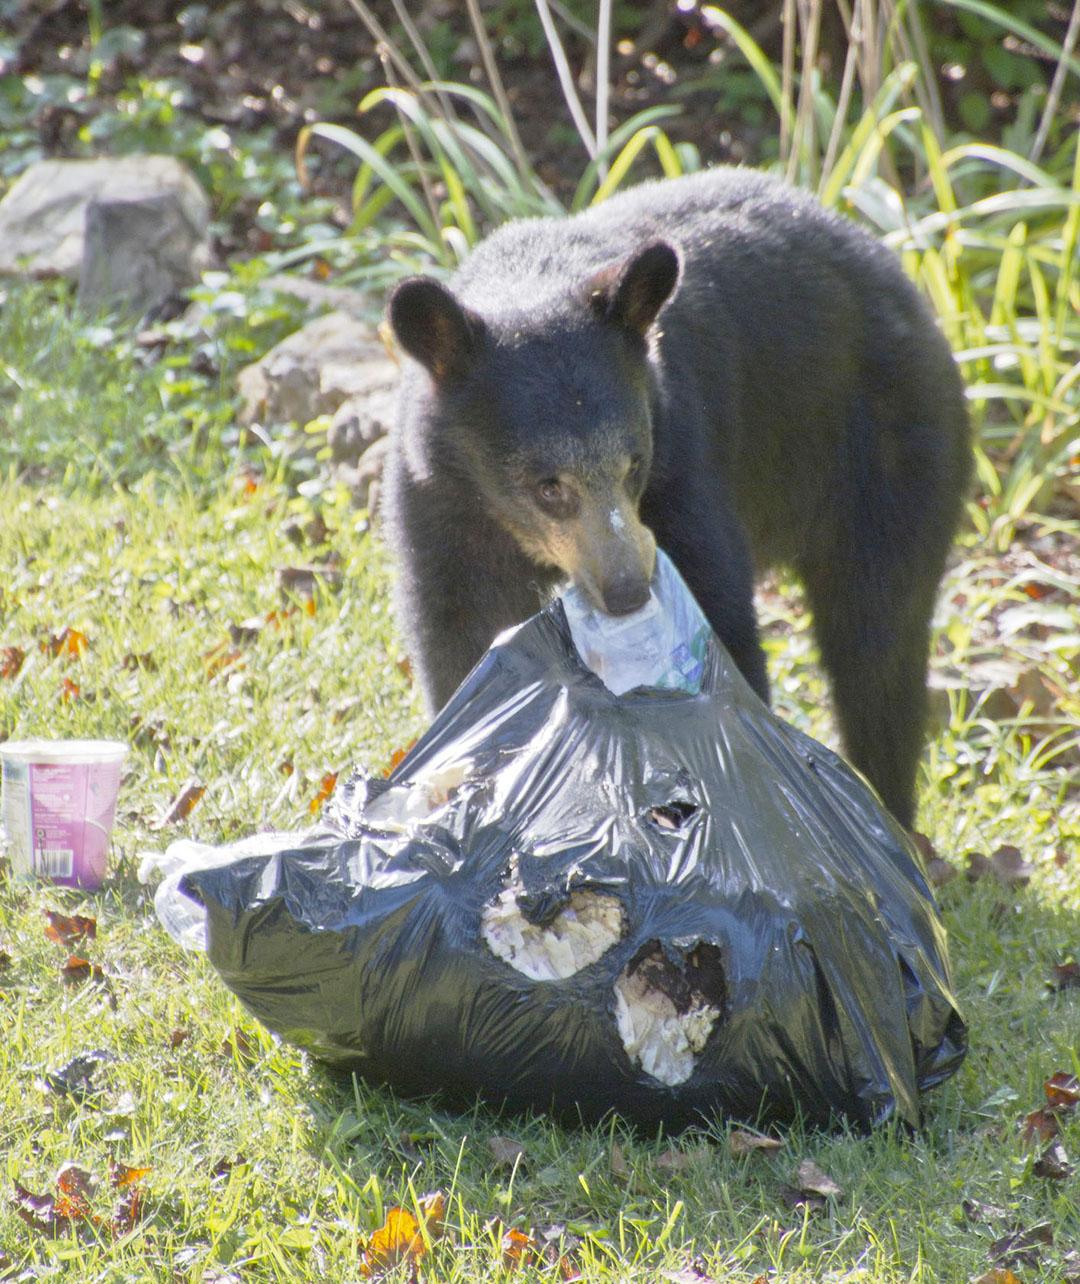 bear ripping into trash bag (photo)